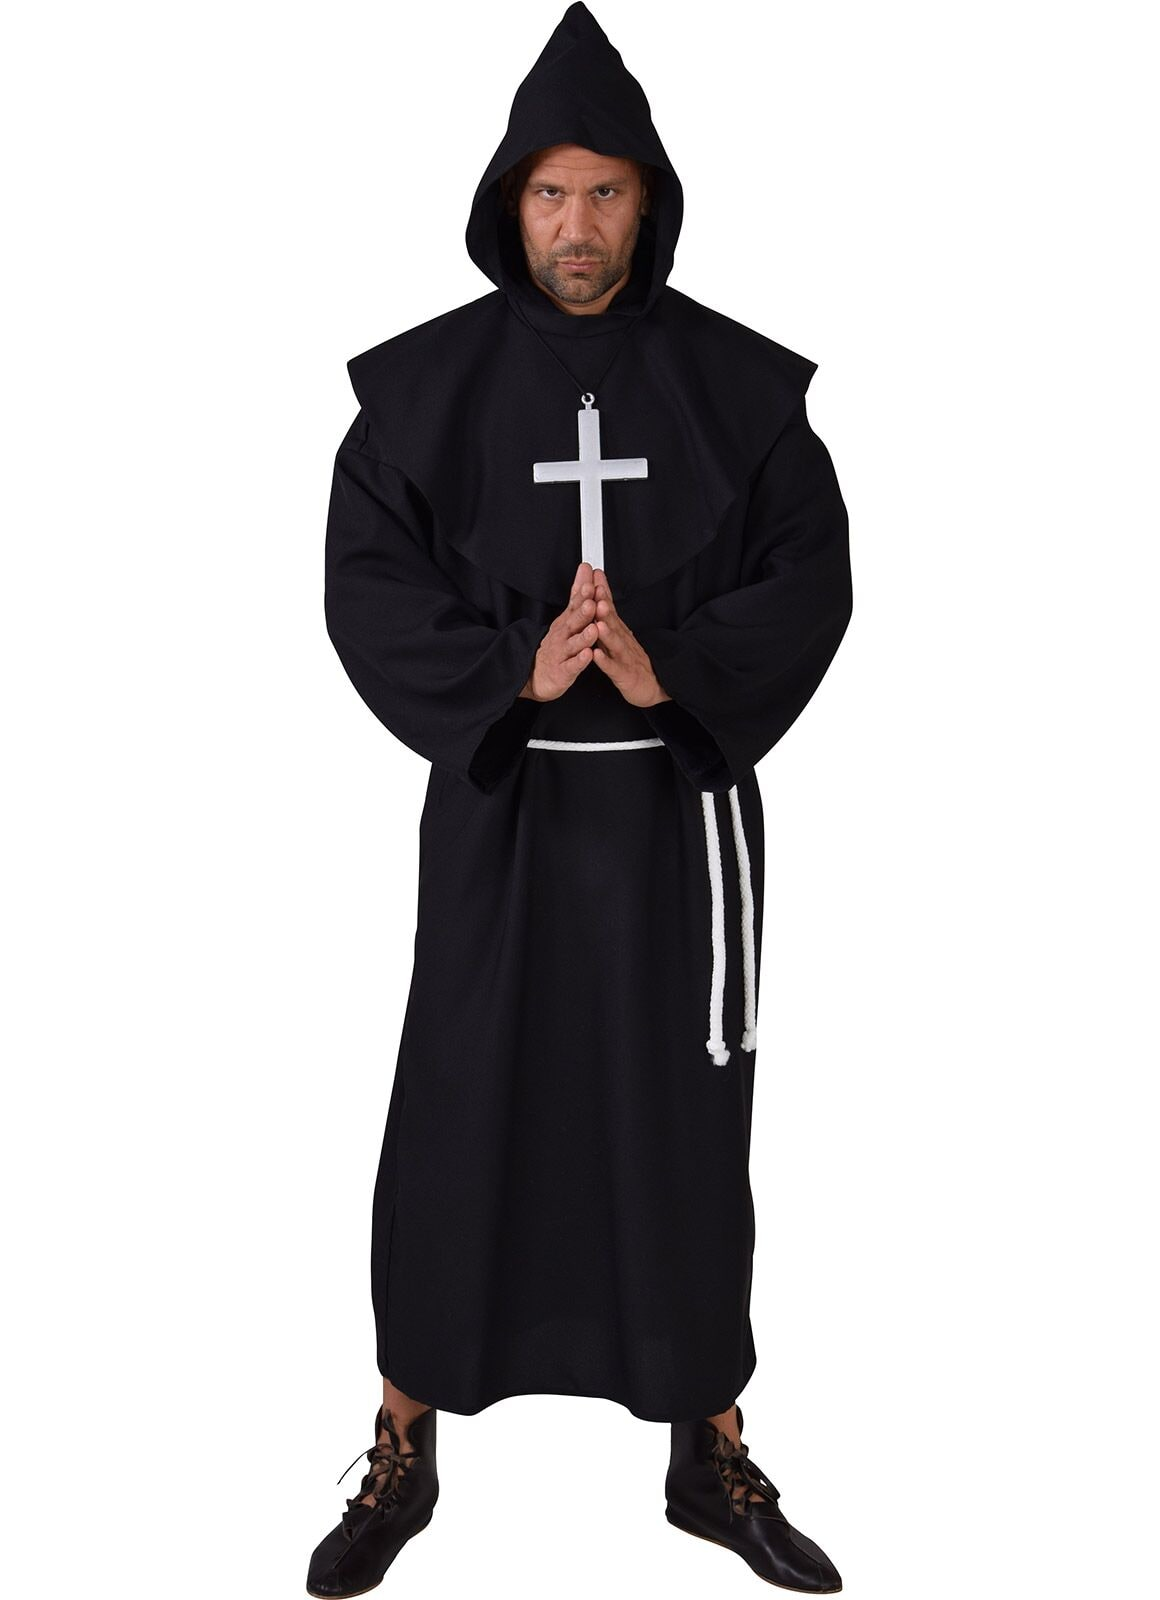 Zwart pater outfit man